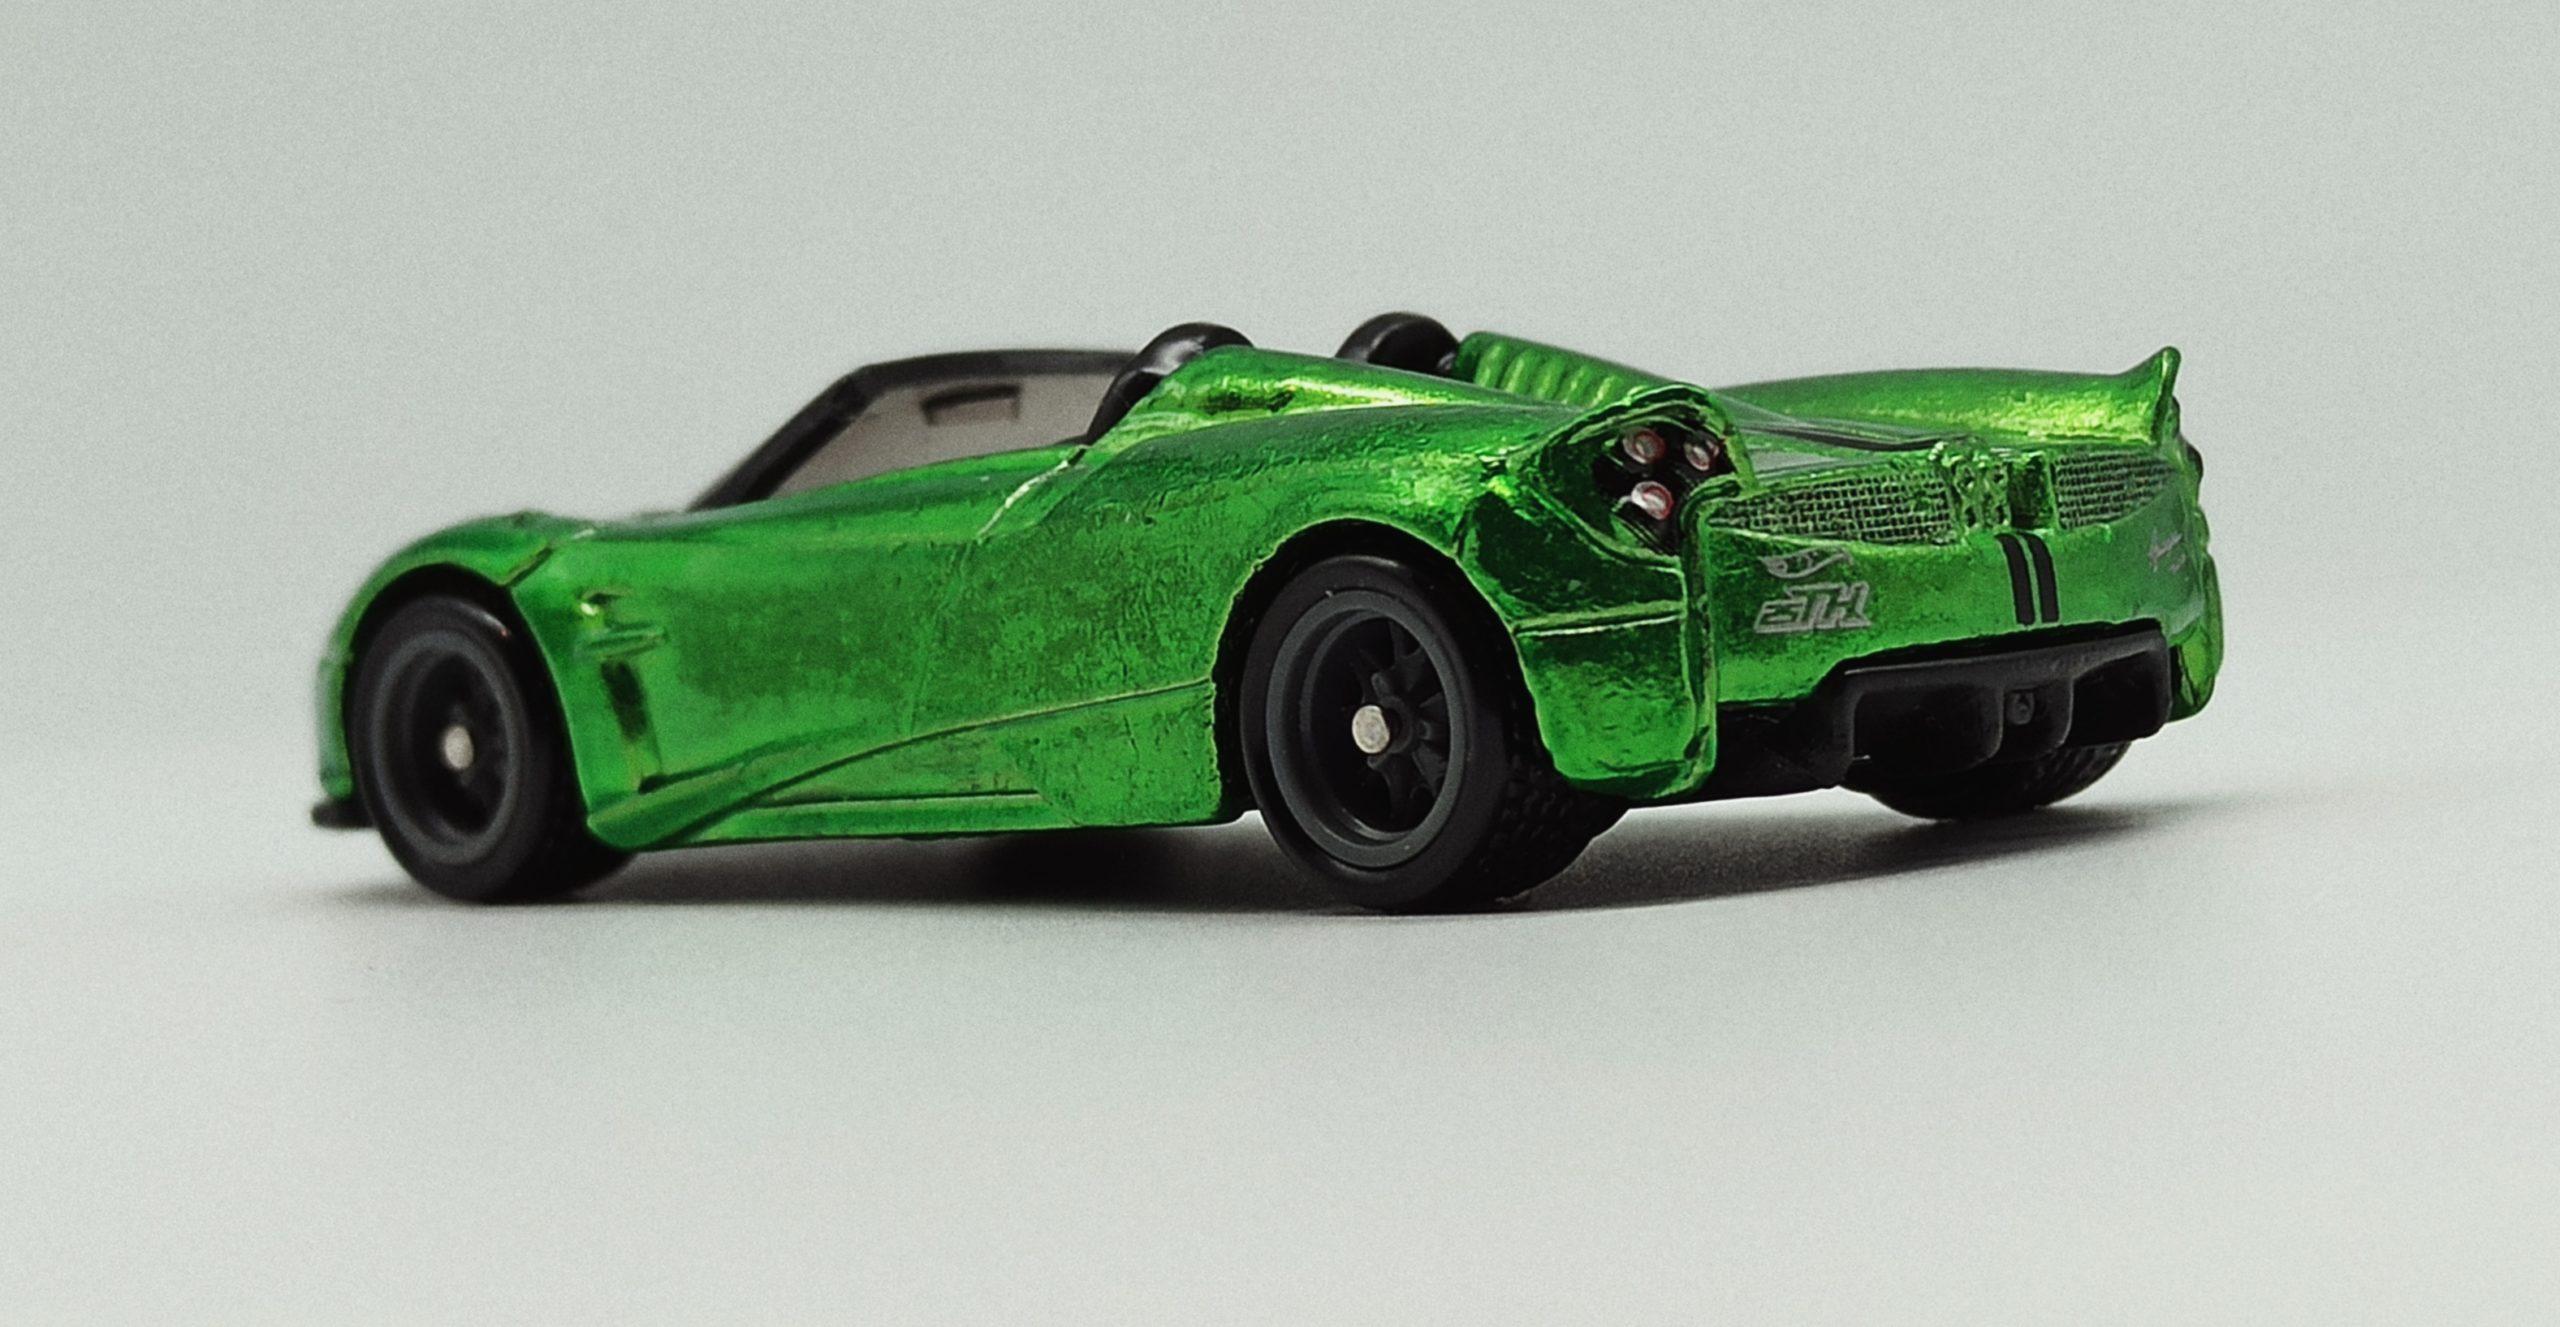 Hot Wheels '17 Pagani Huayra Roadster (GHG21) 2020 (241/250) HW Roadsters (5/5) spectraflame green Super Treasure Hunt (STH) back angle